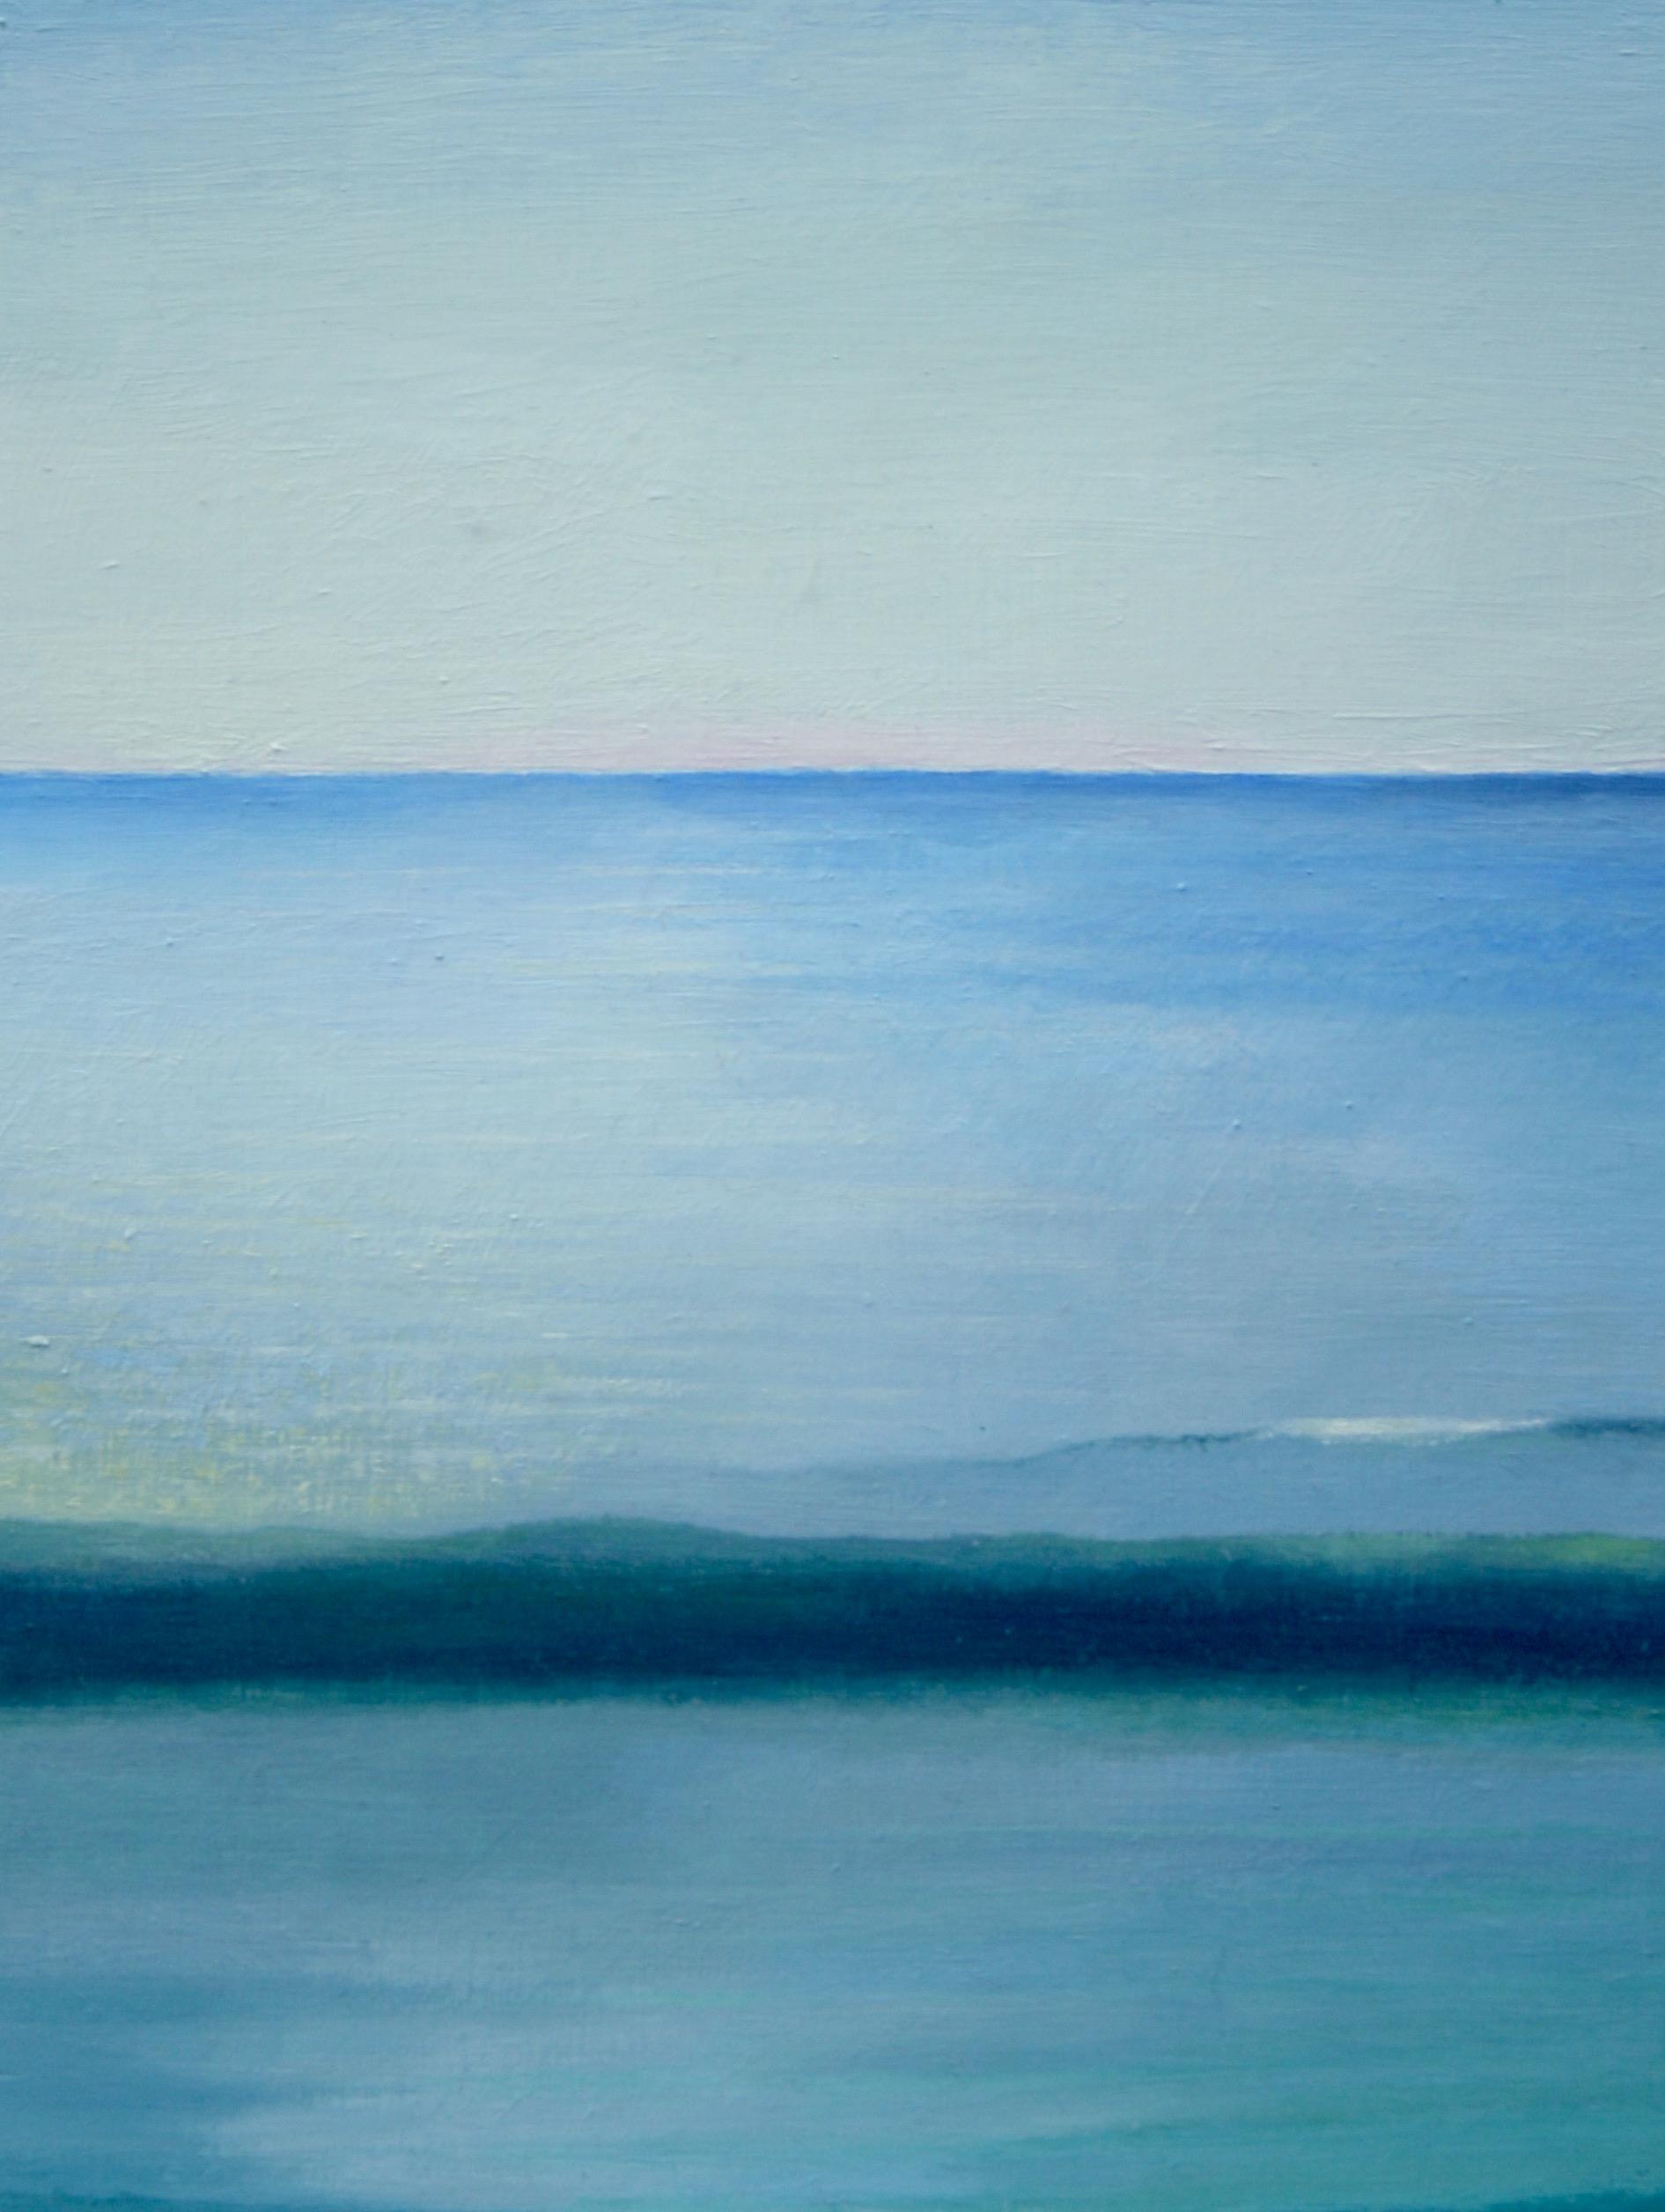 Horizon, 12 x 9 in, Oil on wood, 2015